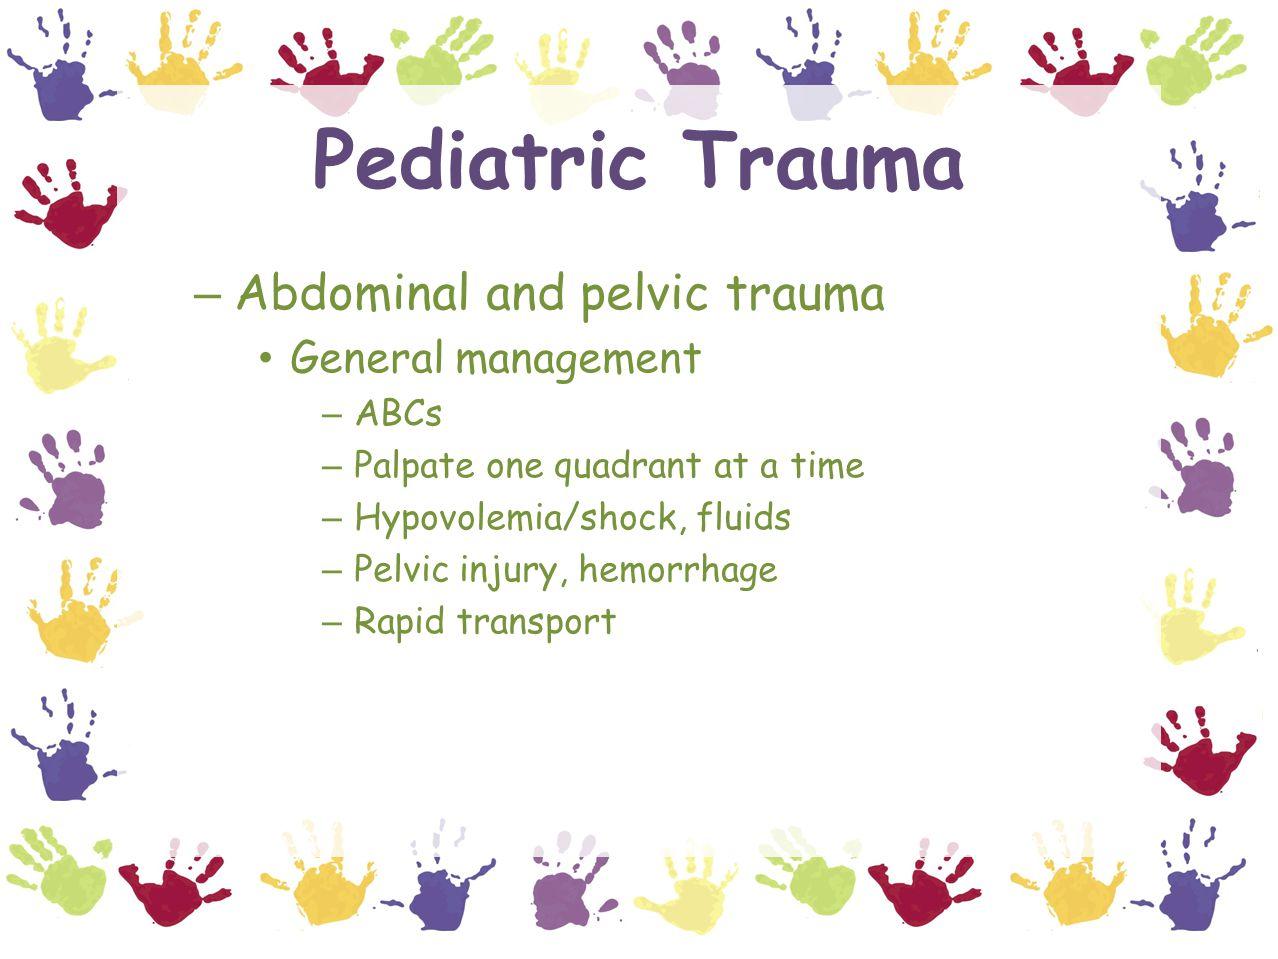 Pediatric Trauma – Abdominal and pelvic trauma General management – ABCs – Palpate one quadrant at a time – Hypovolemia/shock, fluids – Pelvic injury, hemorrhage – Rapid transport